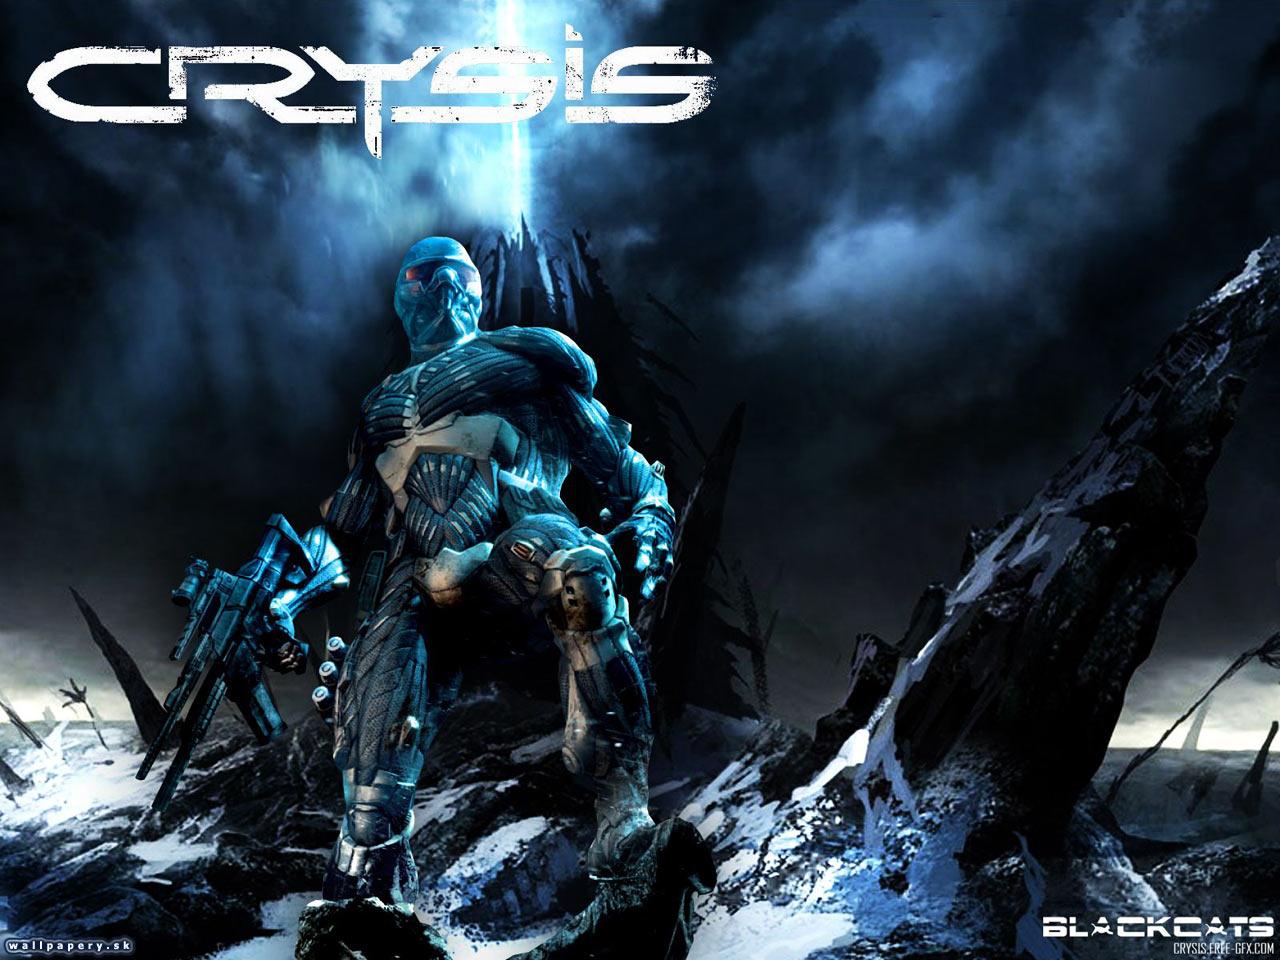 crysis wallpaper background crytek frankfurt fps first person shooter 1280x960